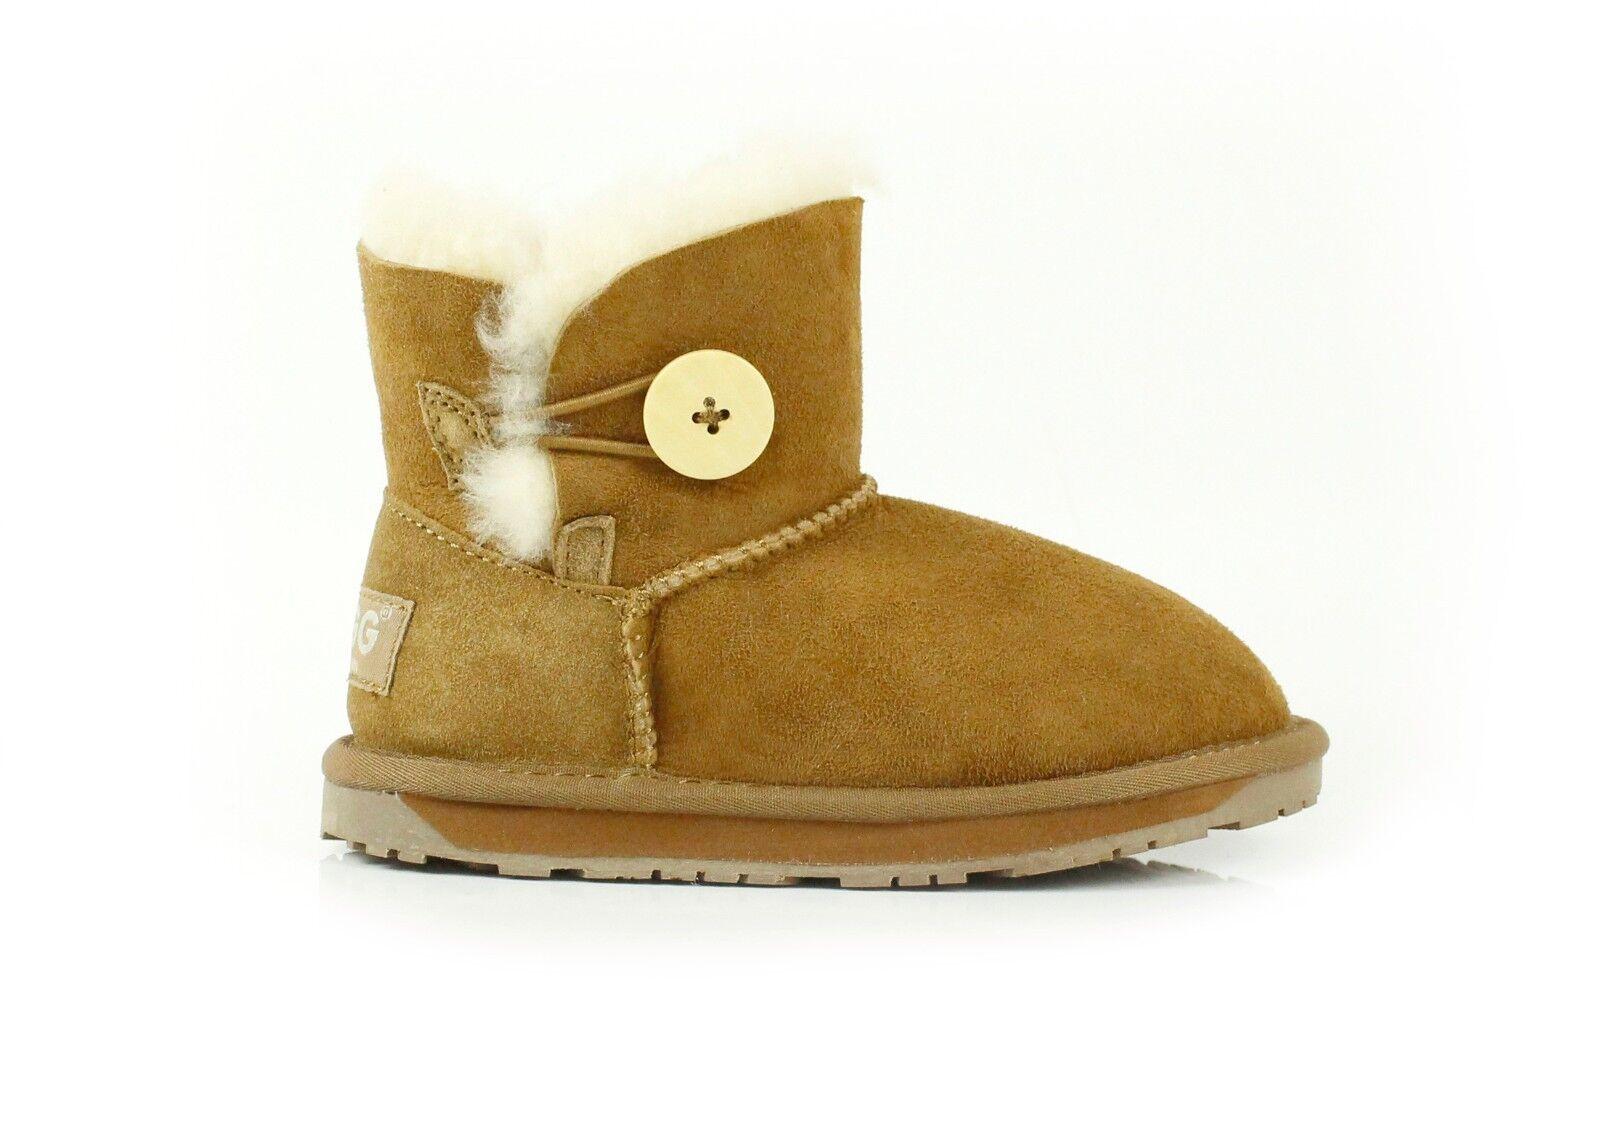 a6cdddff Barn UGG Boots - Barn Mini Button, Premium Australian Sheepskin, Vattentålig